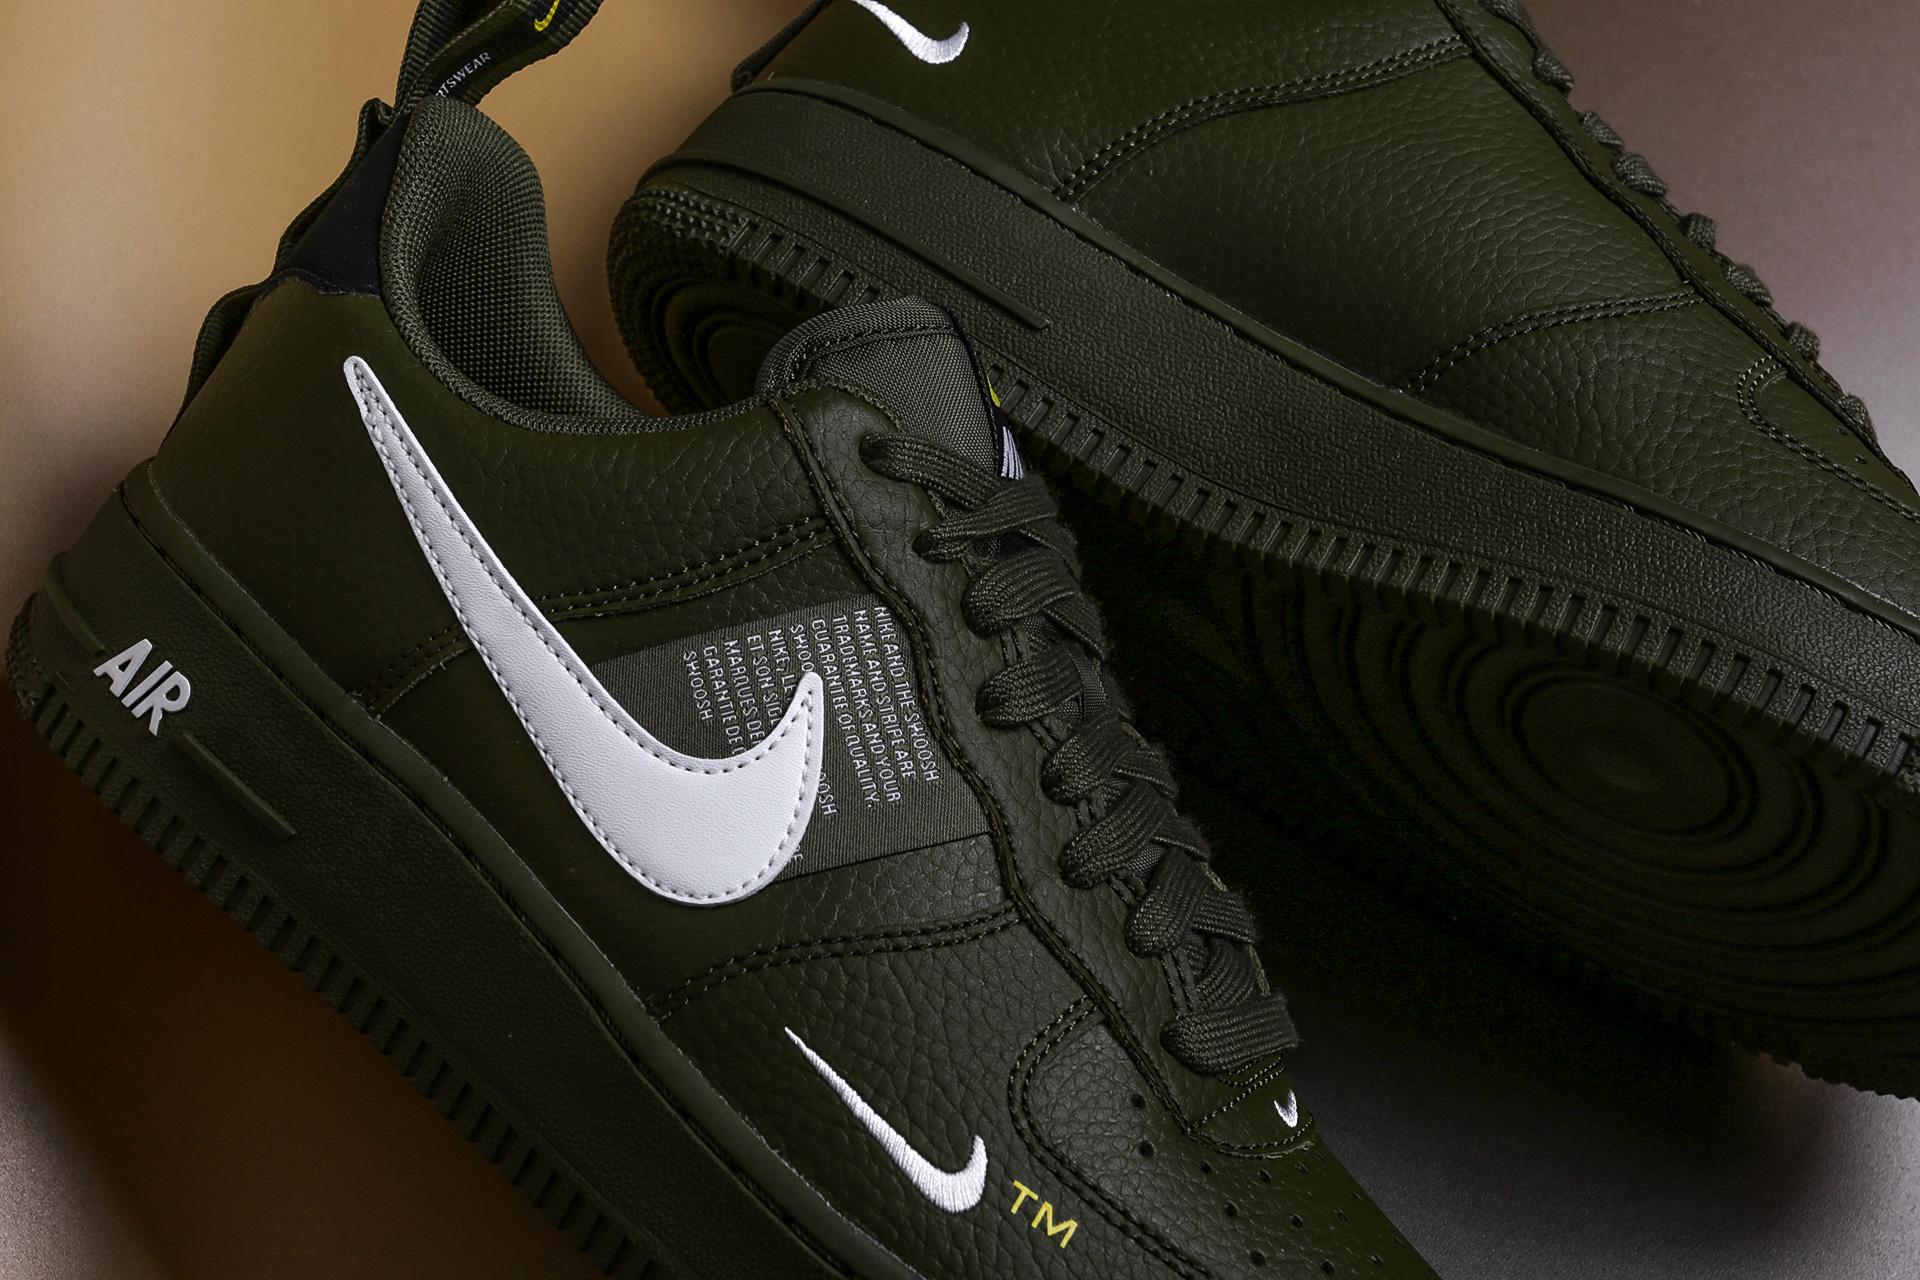 b1c33ab3 ... Купить мужские зеленые кроссовки Nike Air Force 1 '07 LV8 Utility -  фото 4 картинки ...